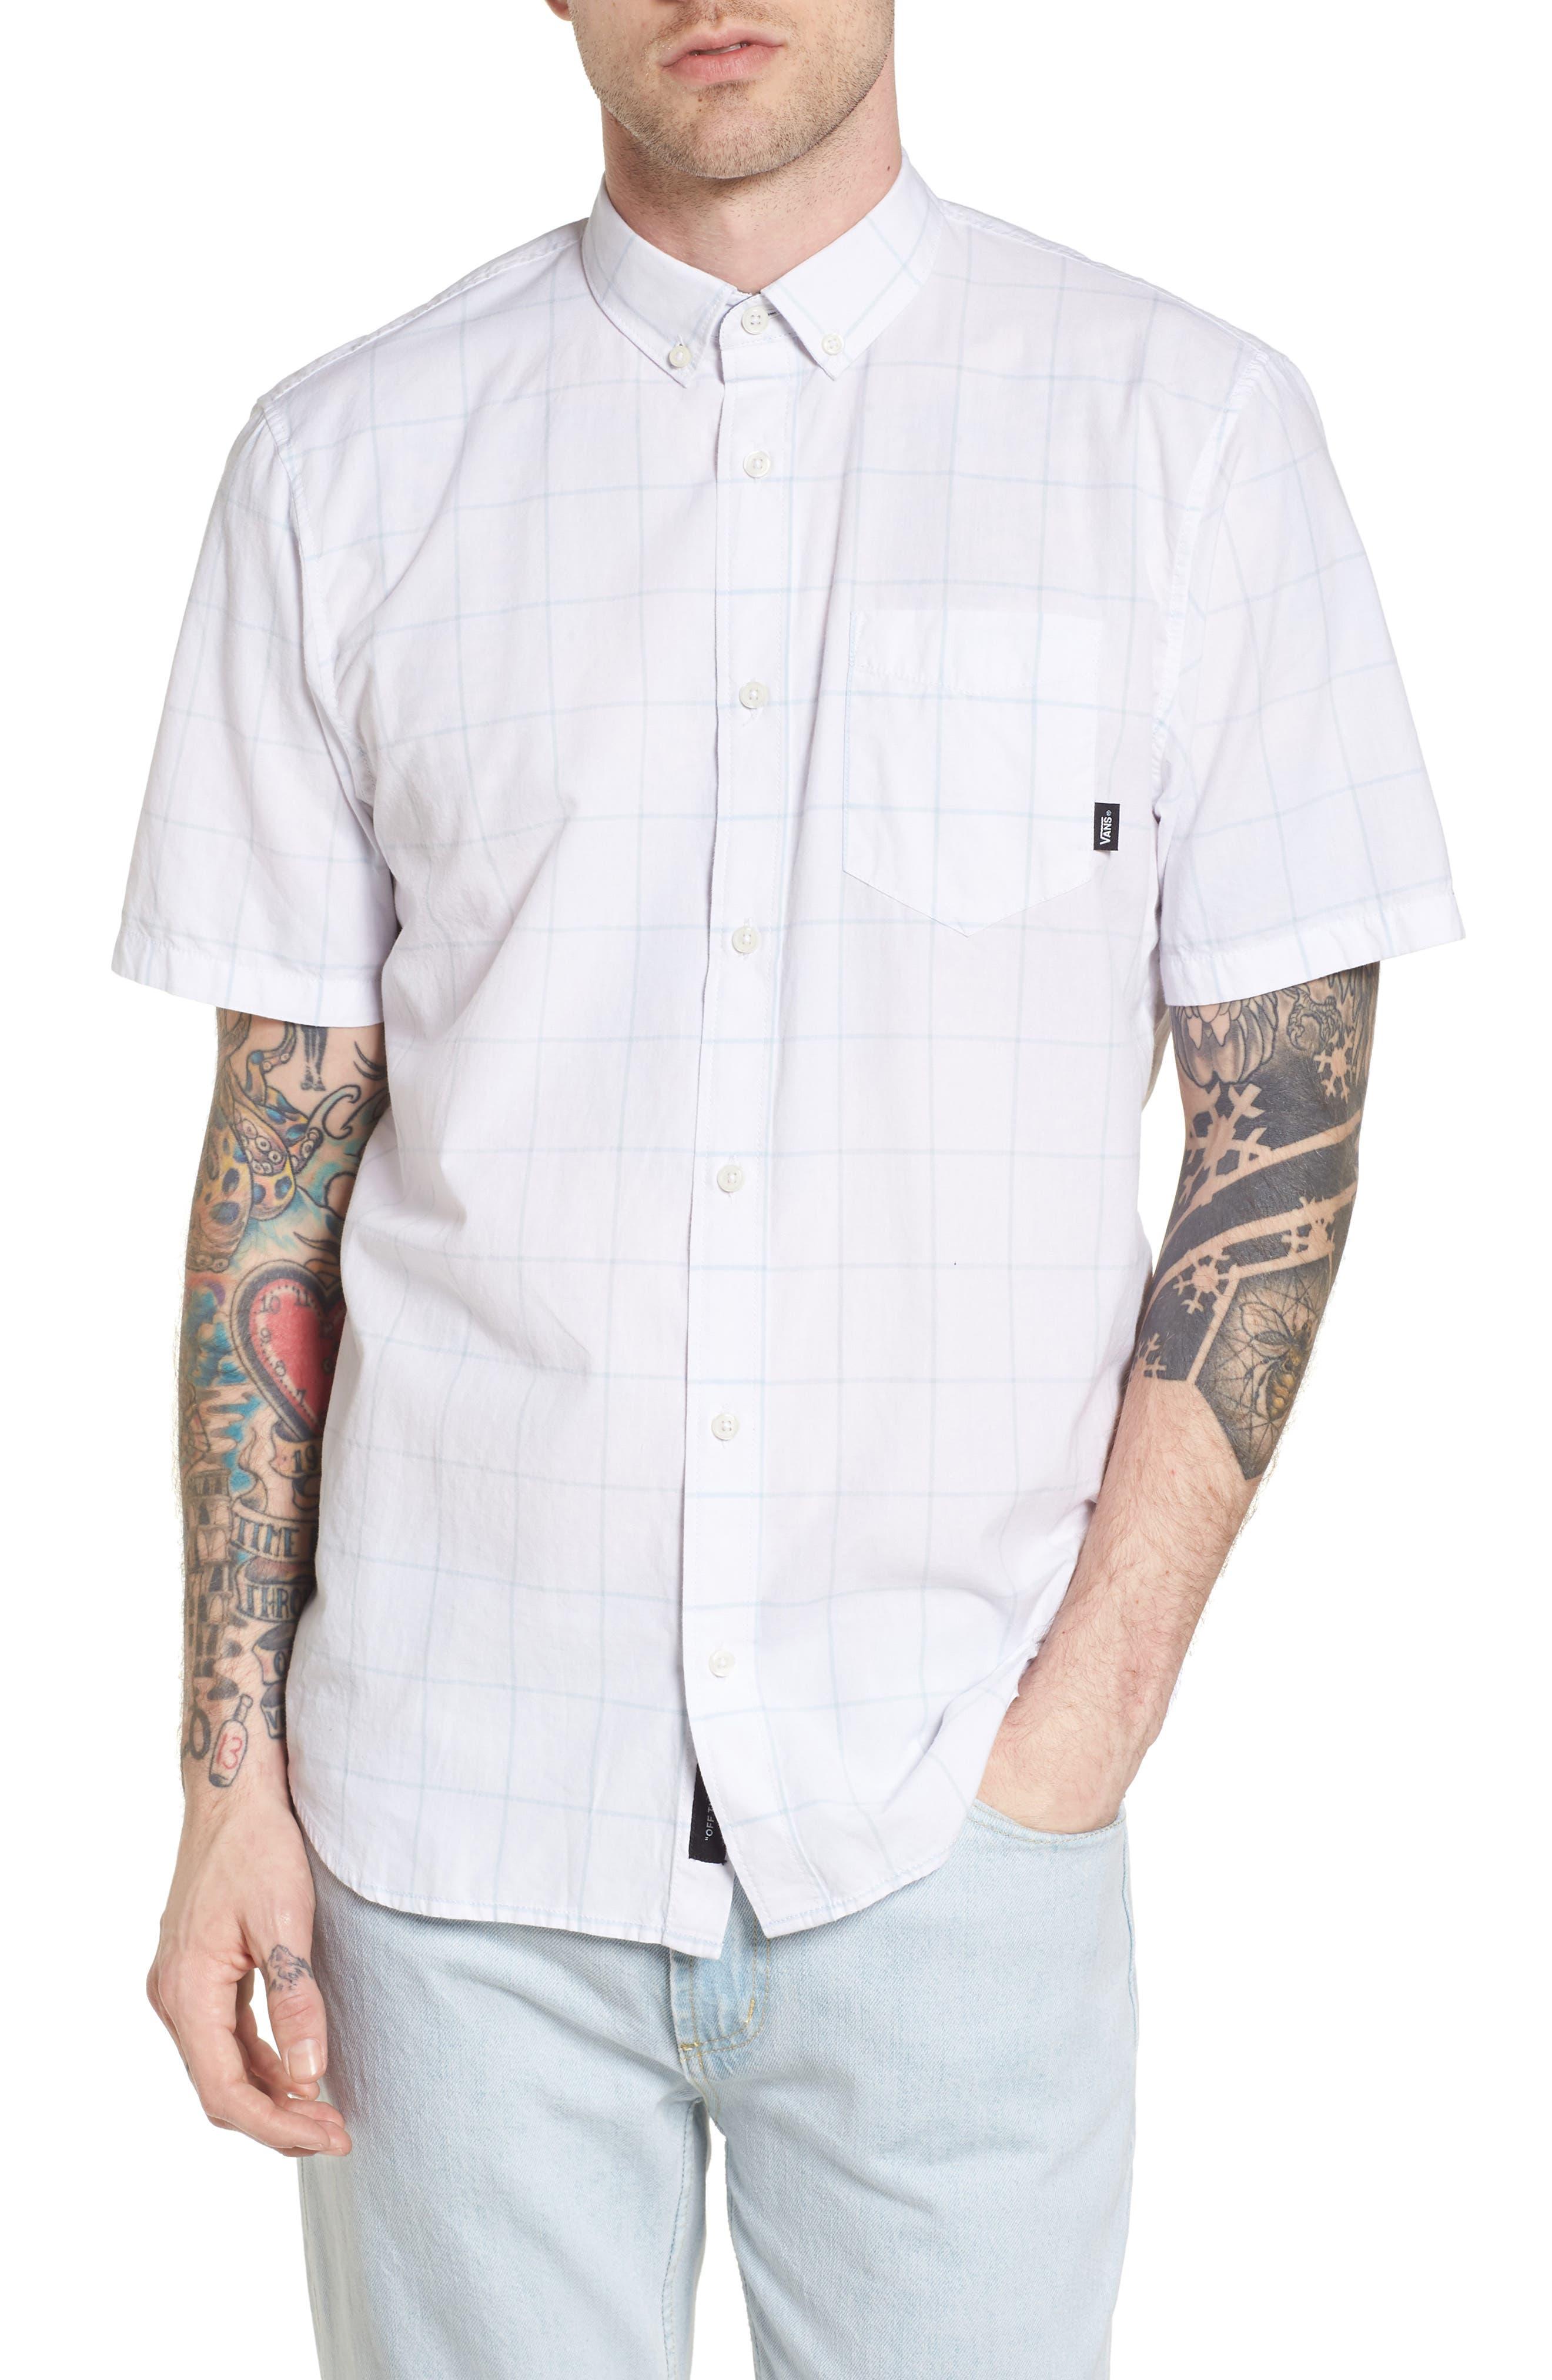 Main Image - Vans Benham Short-Sleeve Shirt